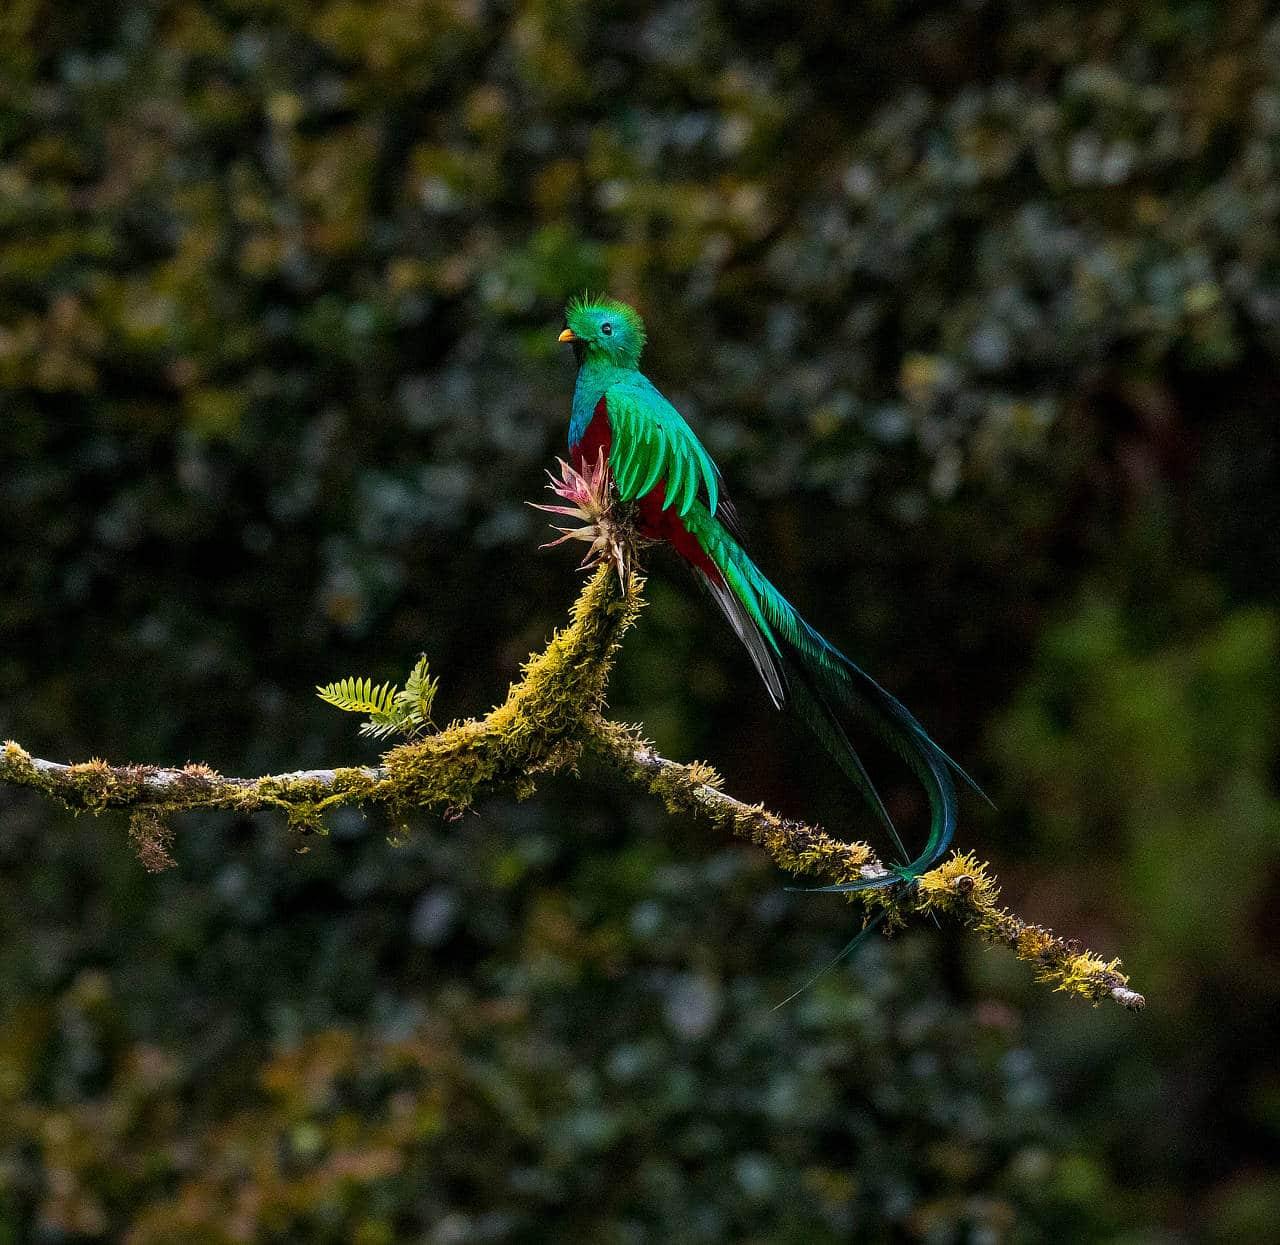 Resplendent Quetzal National Bird of Guatemala Whitehawk Birding